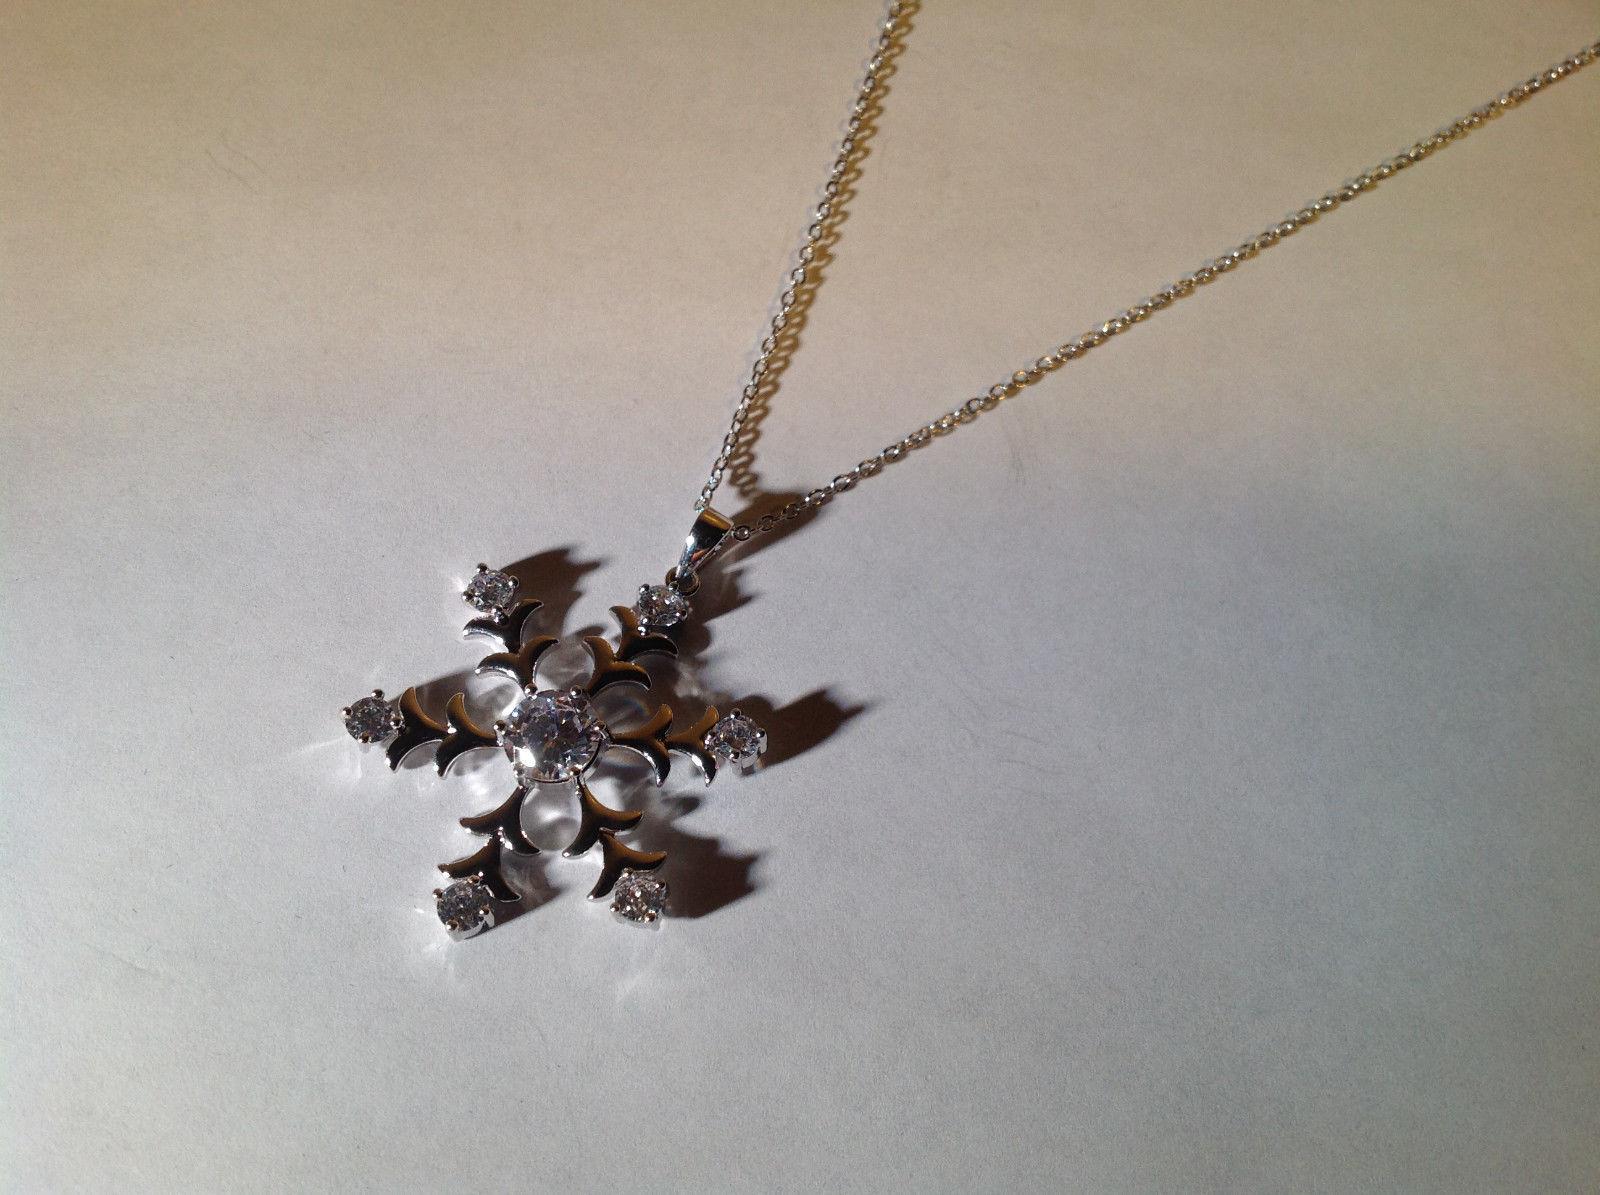 White Gold Rhodium 3.5 CT CZ Snowflake Drop Pendant Lobster Clasp Adjustable